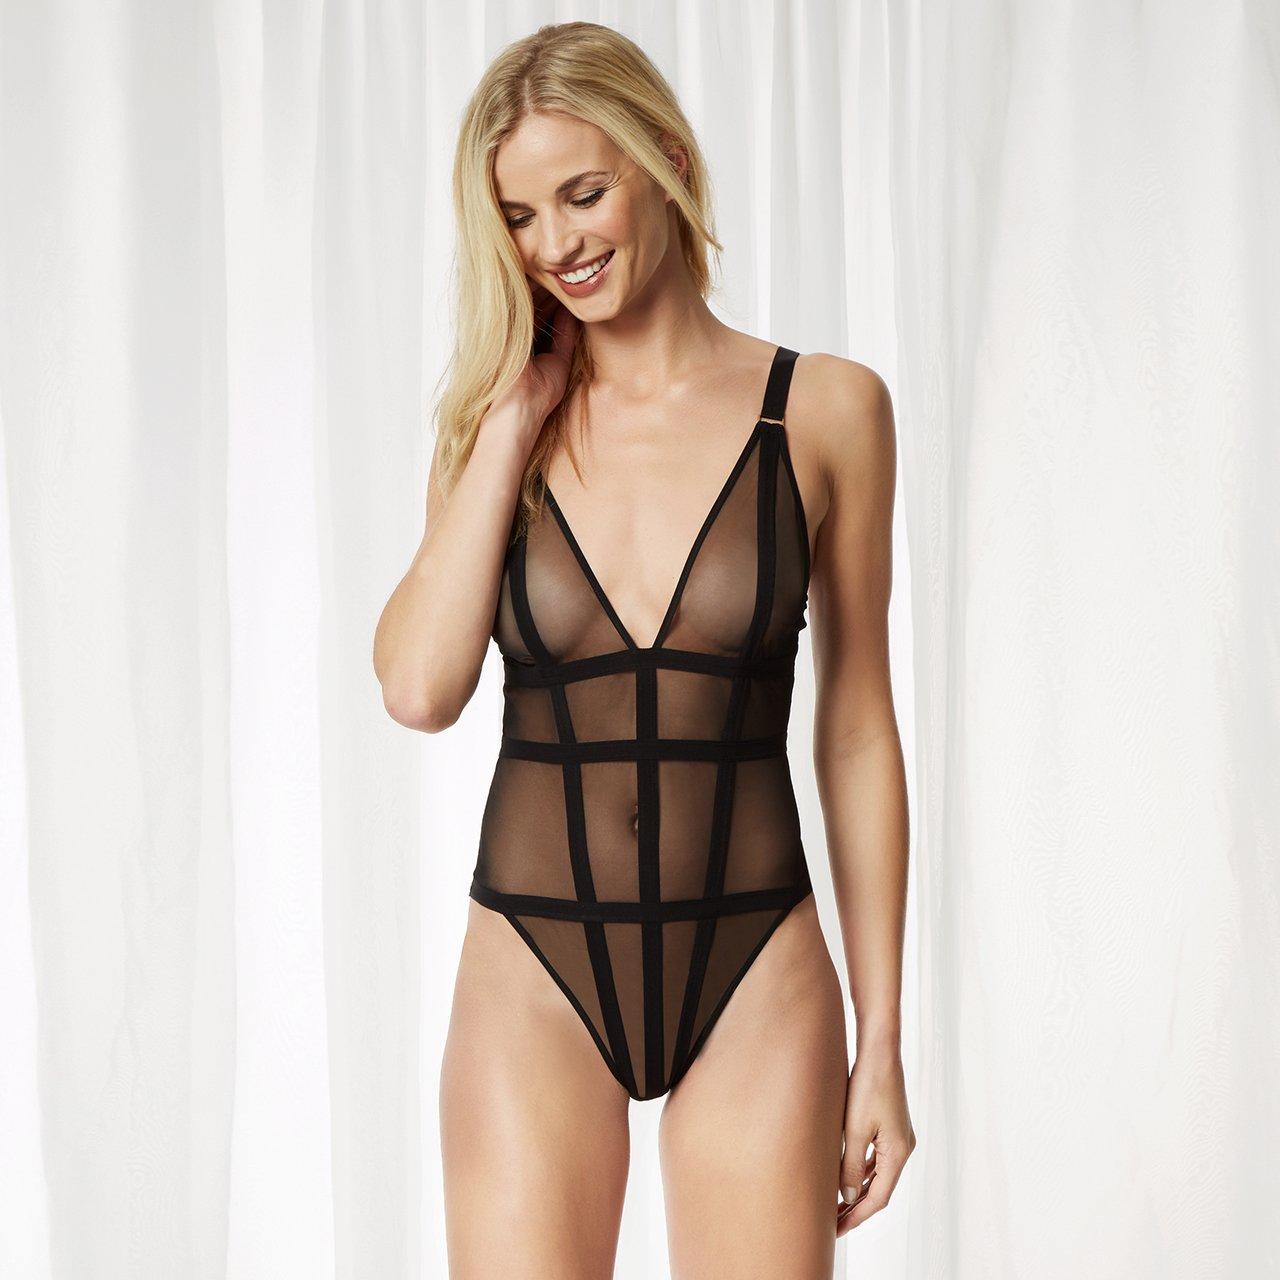 Bluebella Karolina Body, new in at £38